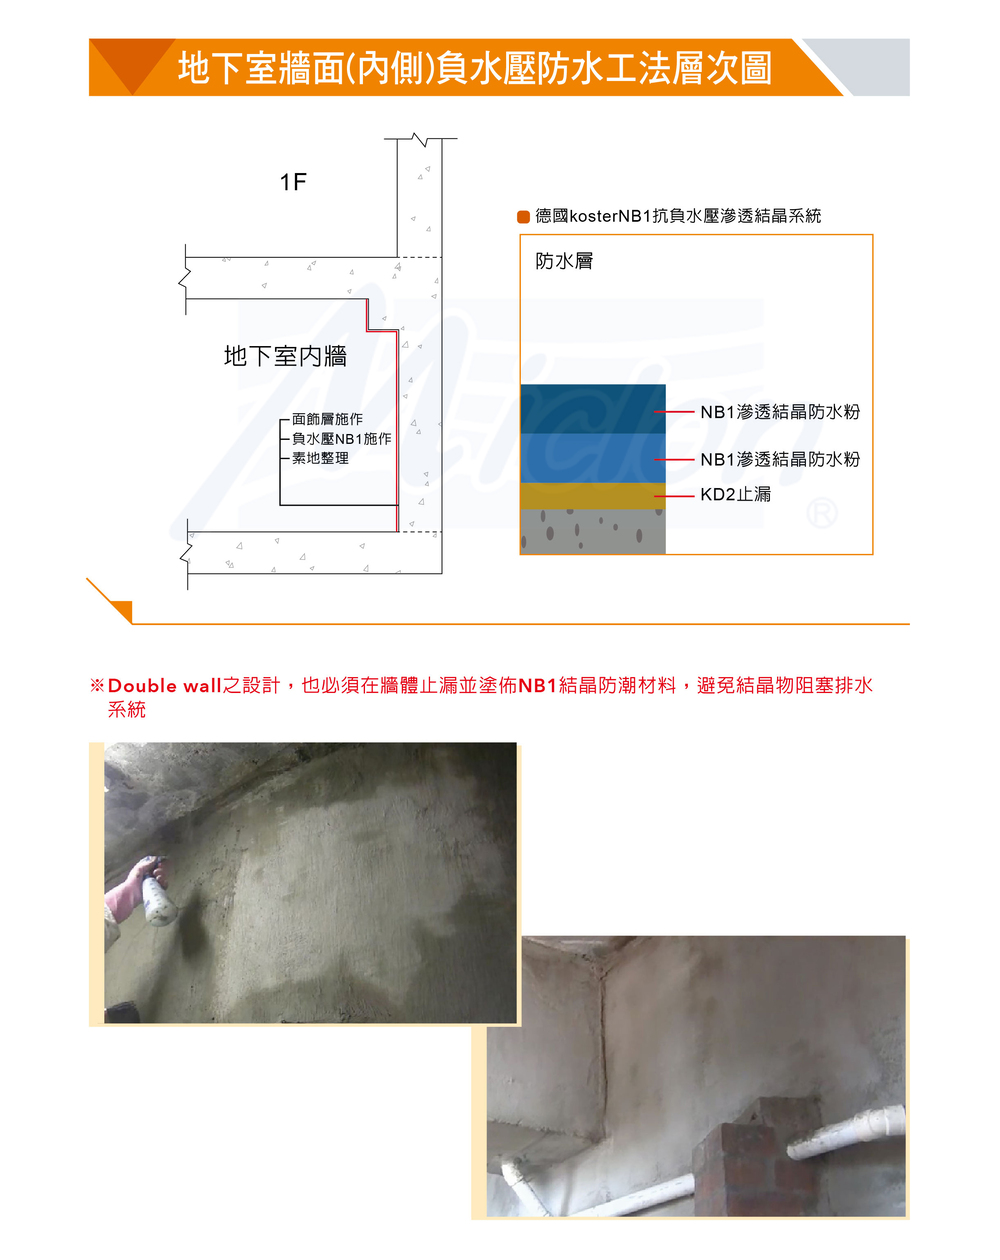 https://www.miclon.com.tw/images/webimg/medium/210305035541.jpeg